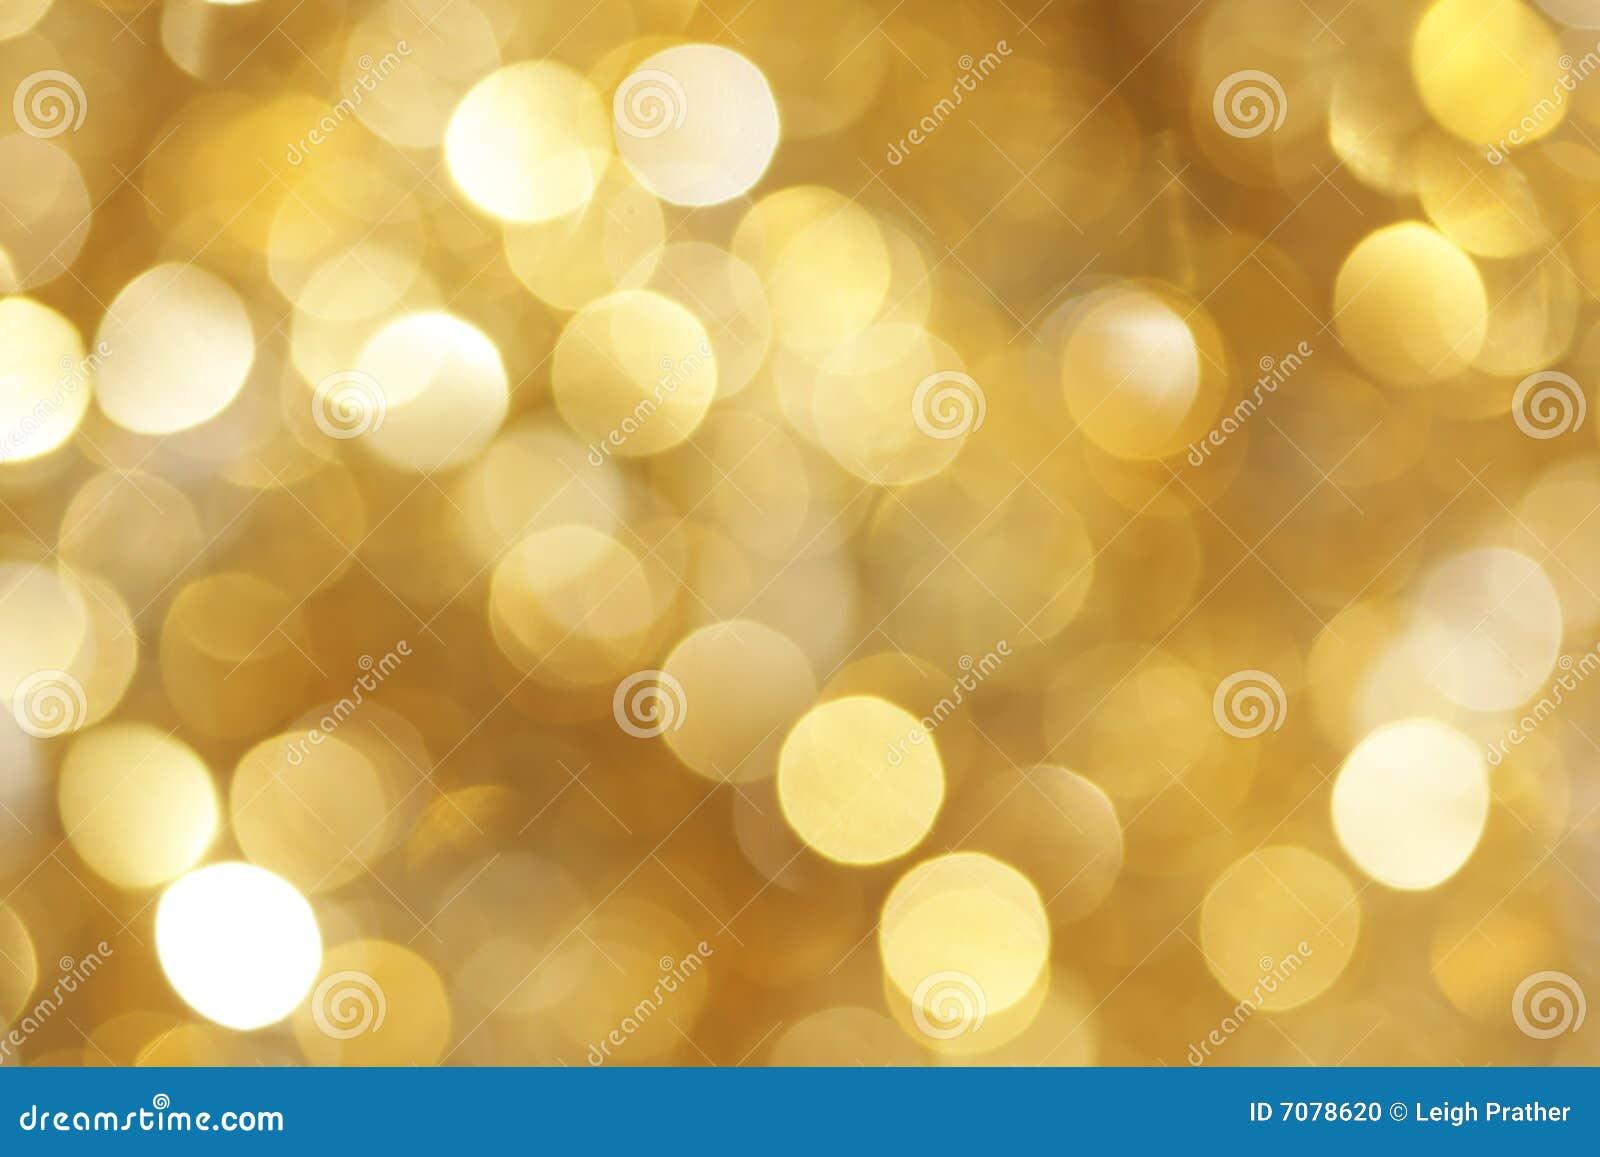 light golden background - photo #18